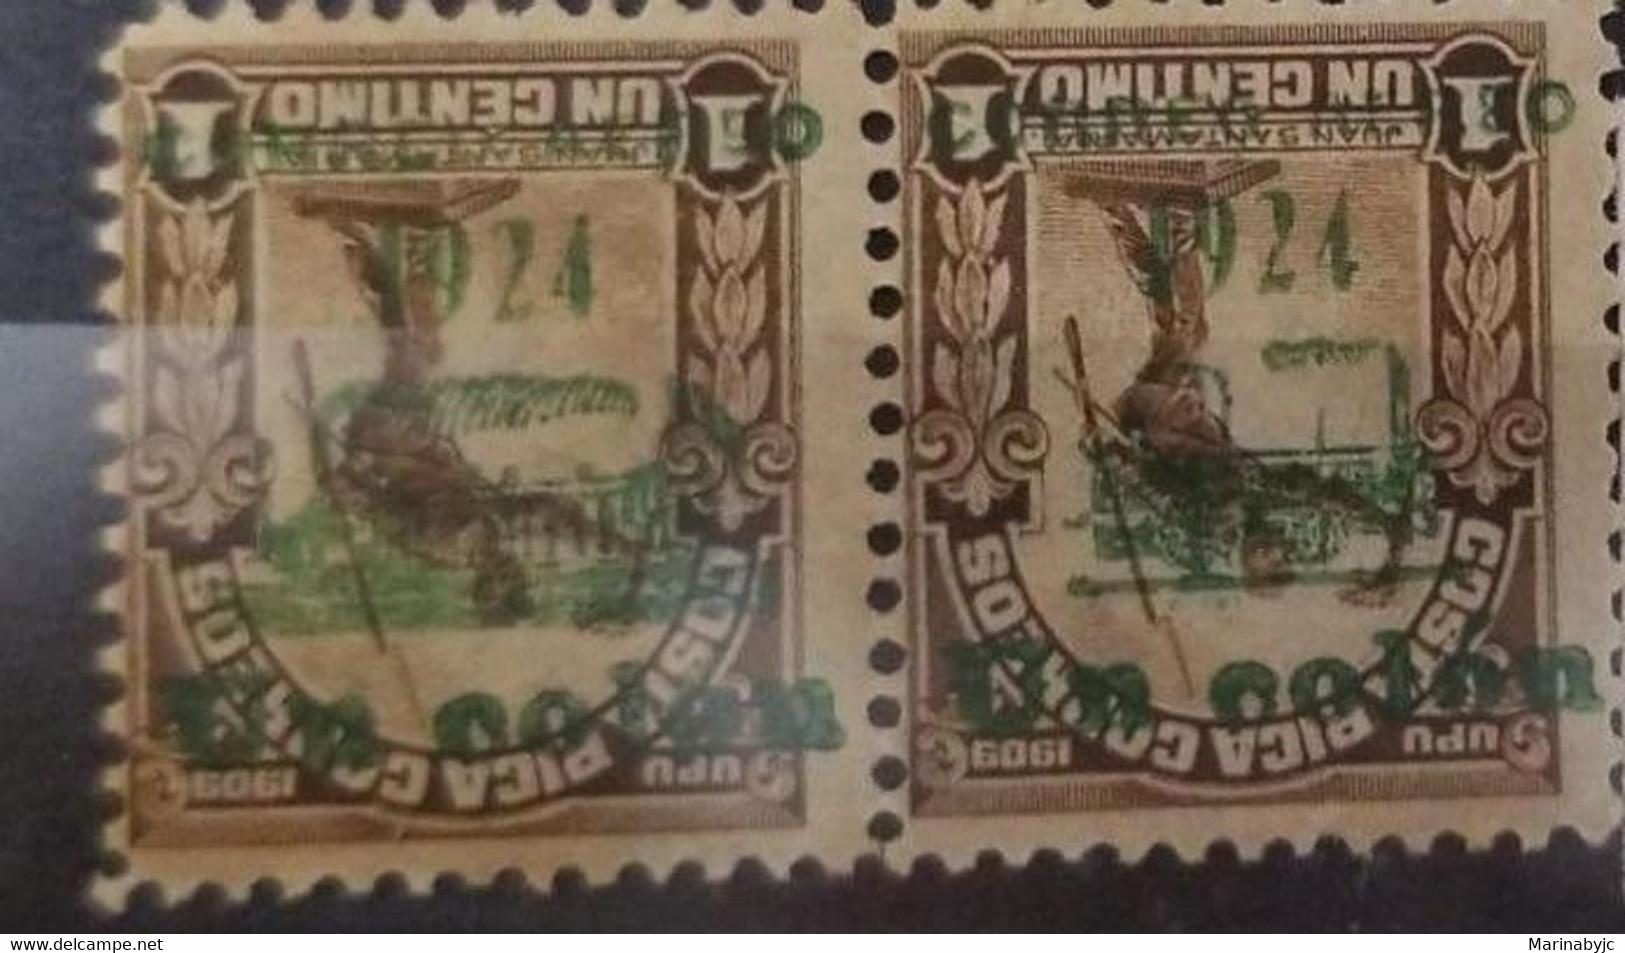 L) 1924 COSTA RICA, JUAN SANTAMARIA, 1 COLON ON 1910 1C BROWN SURCHARGE ESSAY IN GREEN INVETD: HORIZ PAIR WITH BOTH TYPE - Costa Rica